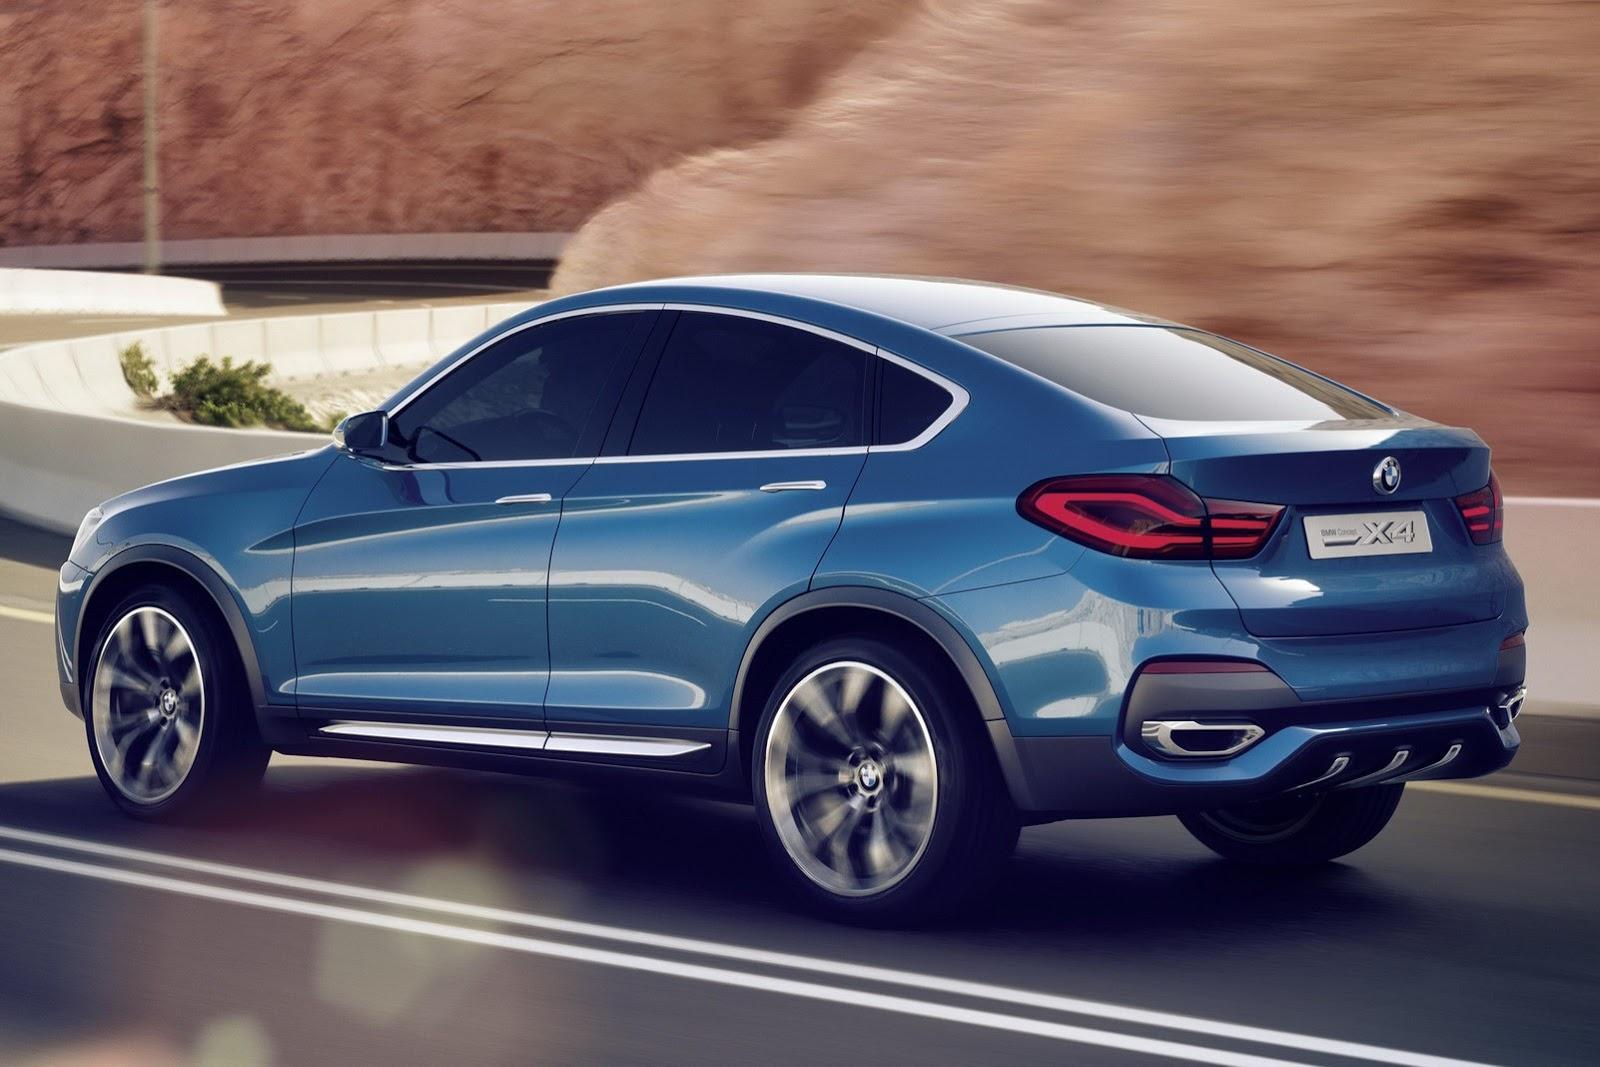 BMW X4 2014 High Resolution Wallpaper Free